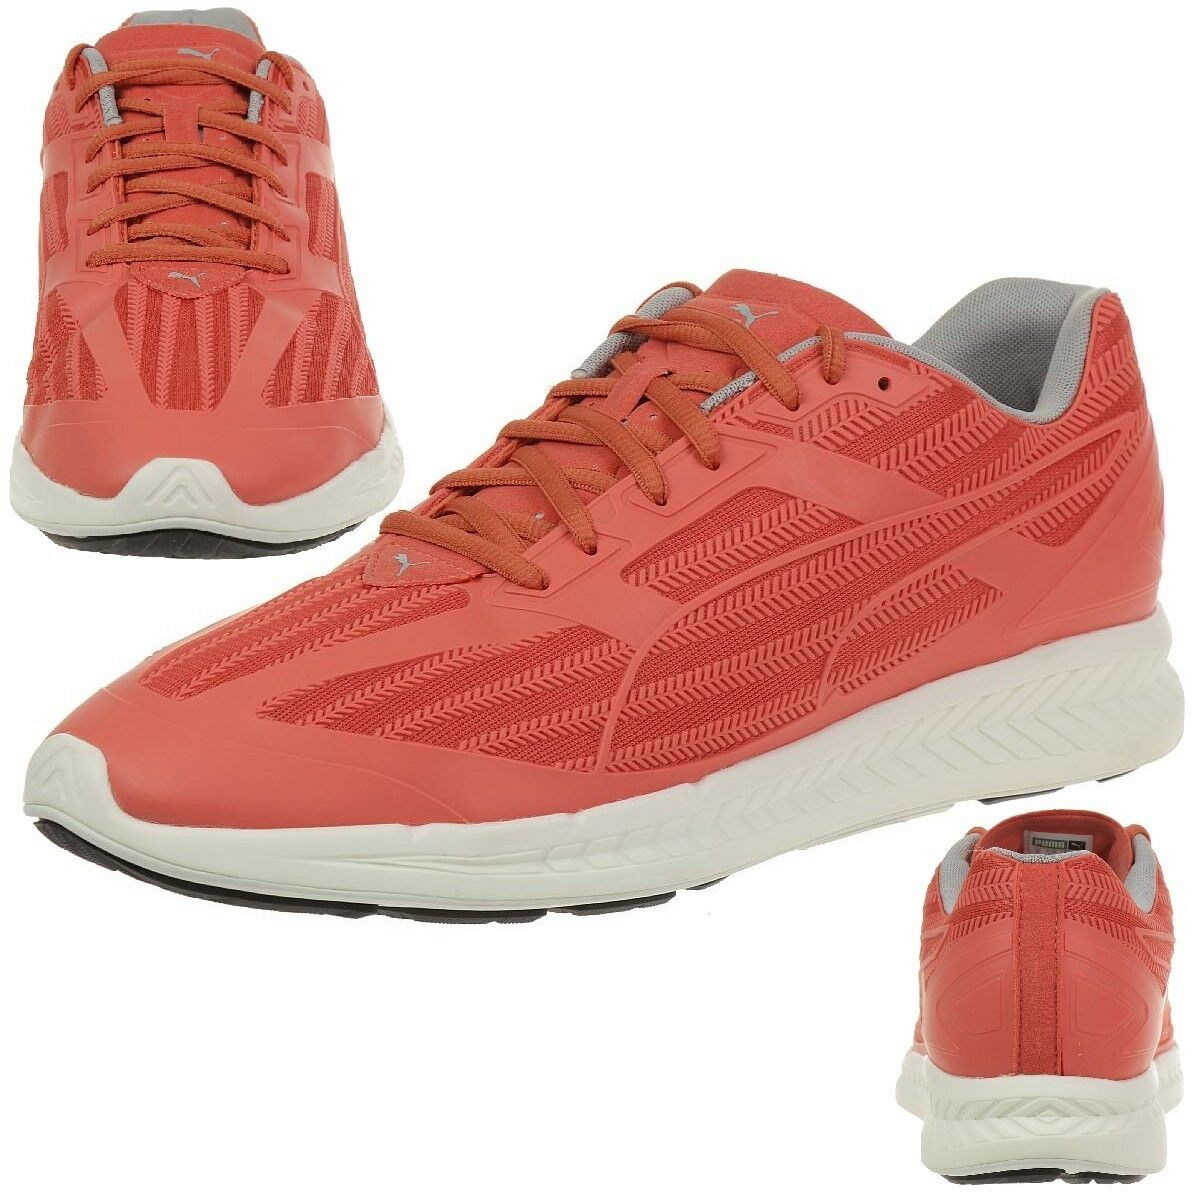 Puma Ignite Select Kurim Jogging zapatos Mens Fitness zapatos 359086 01